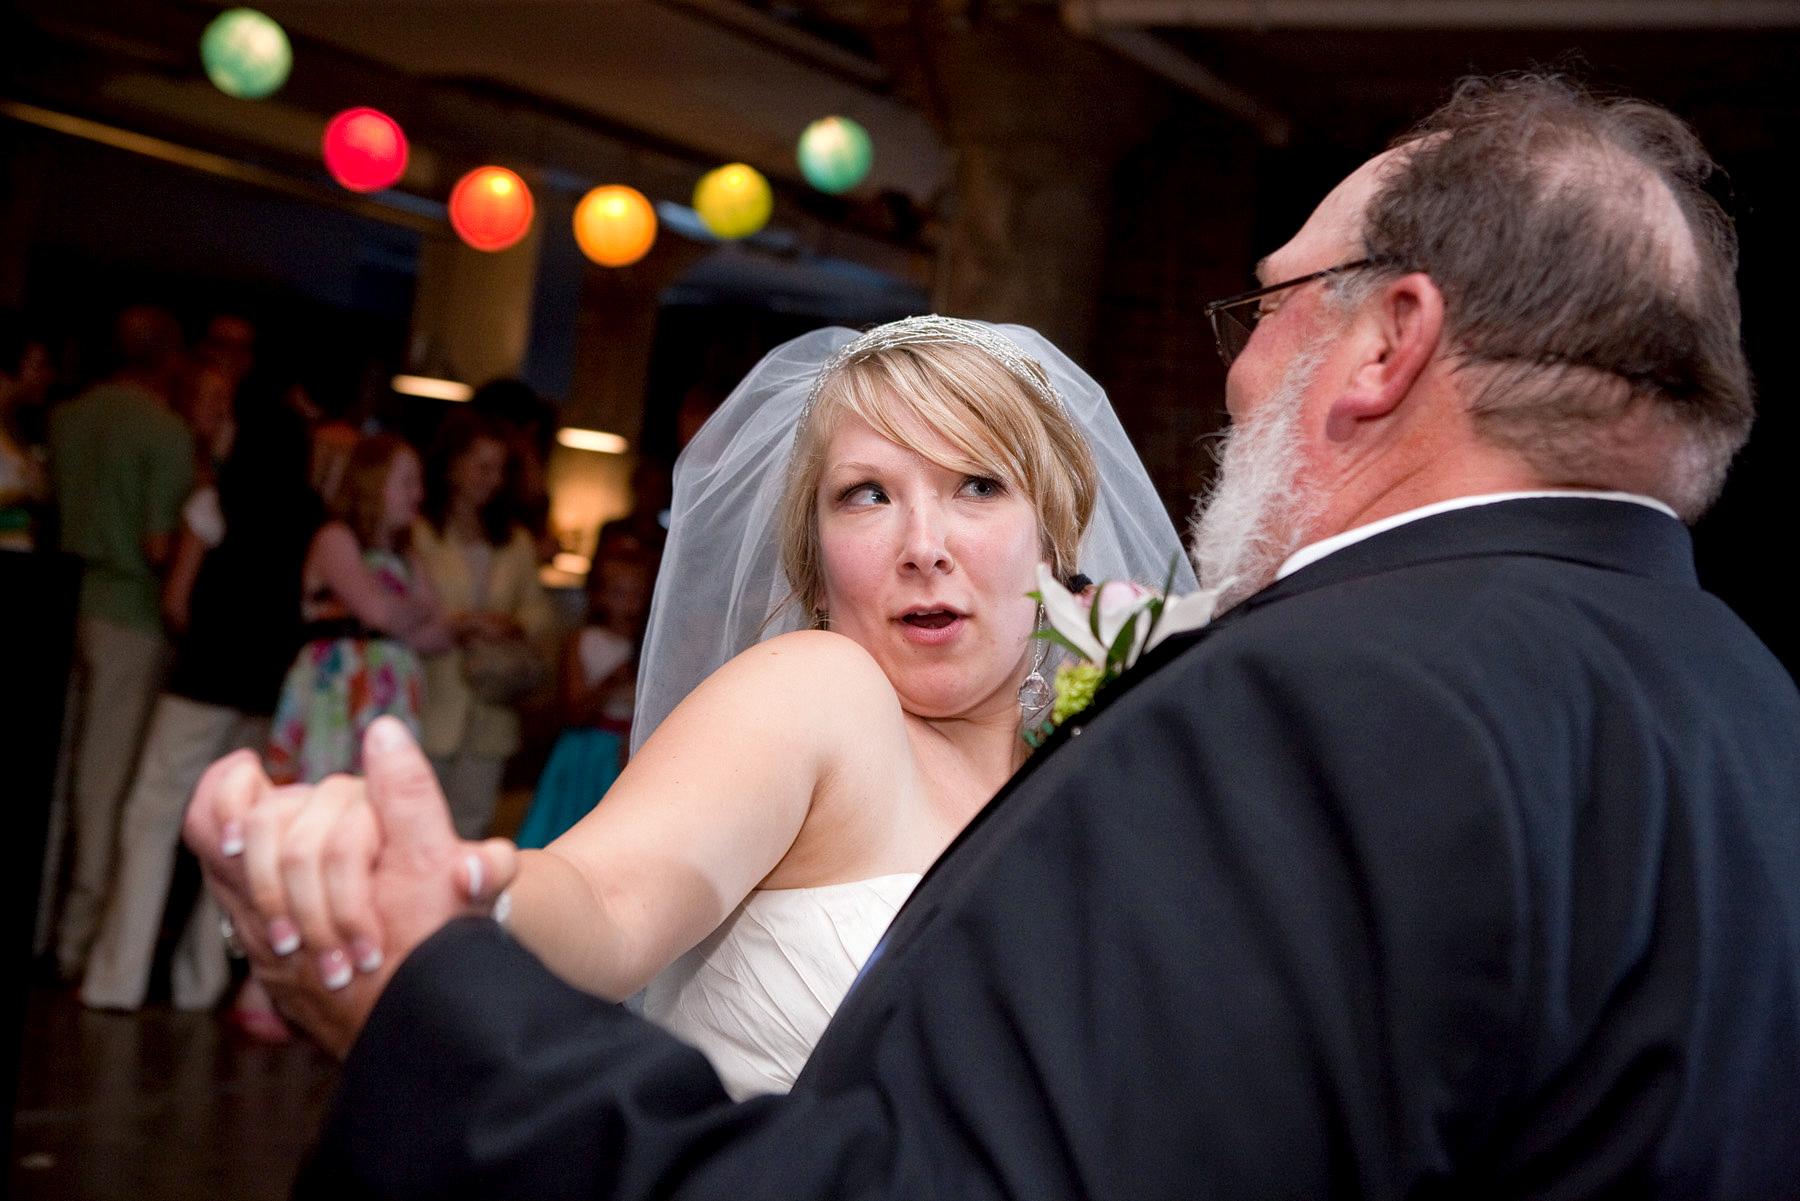 wedding-photography-saint-paul-mark-kegans-629.jpg